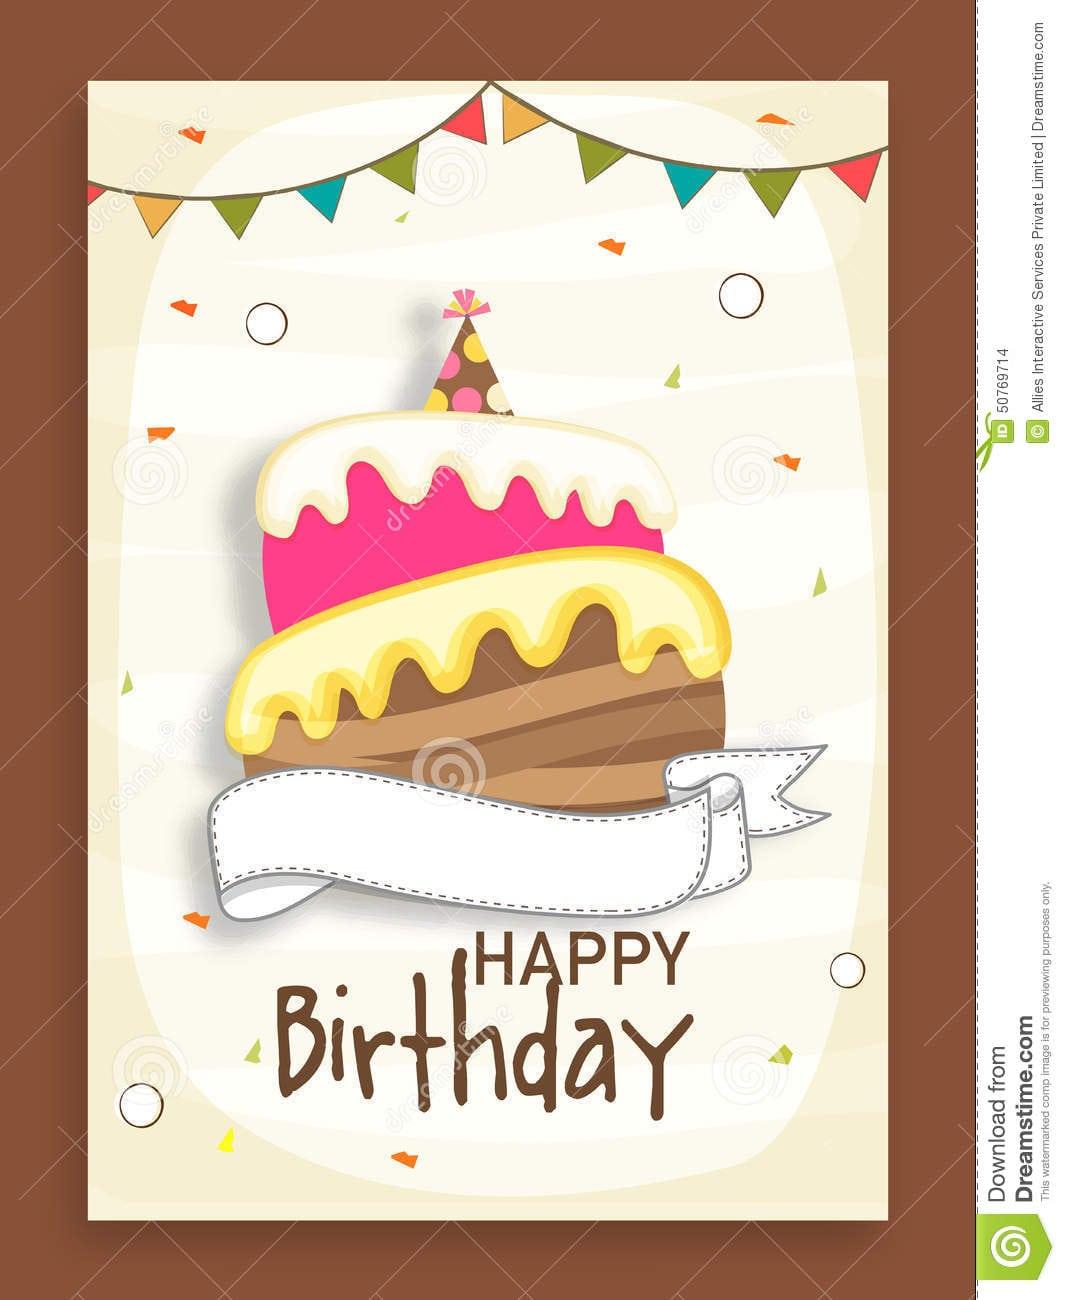 Birthday Party Celebration Invitation Card Design  Stock